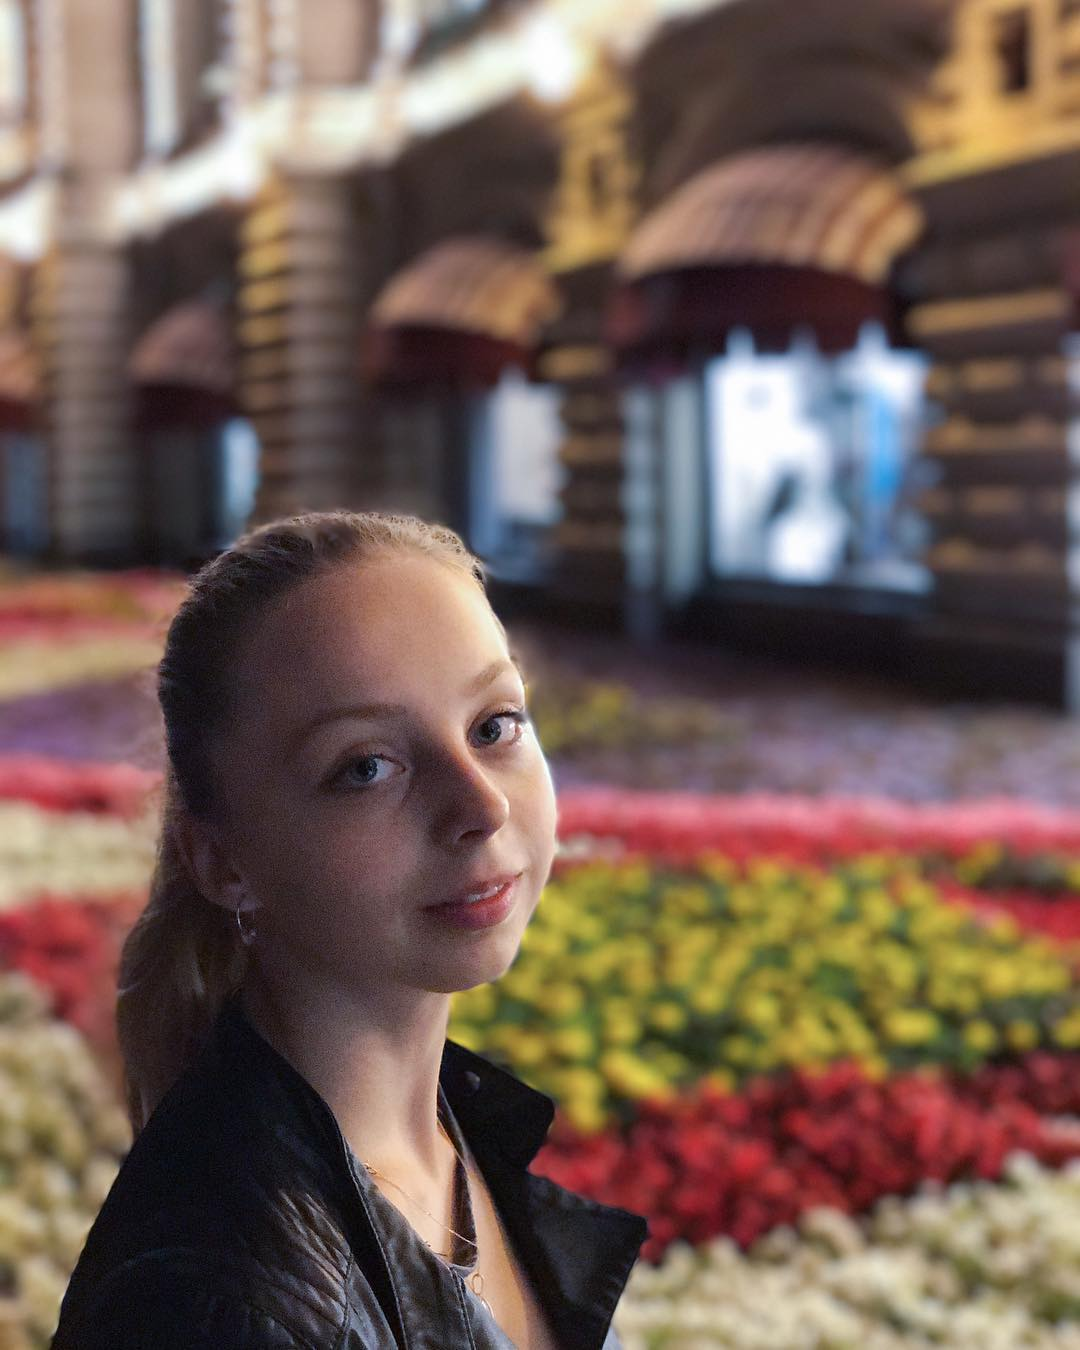 Александра Бойкова-Дмитрий Козловский - Страница 7 Vu4R_P-Pbjc